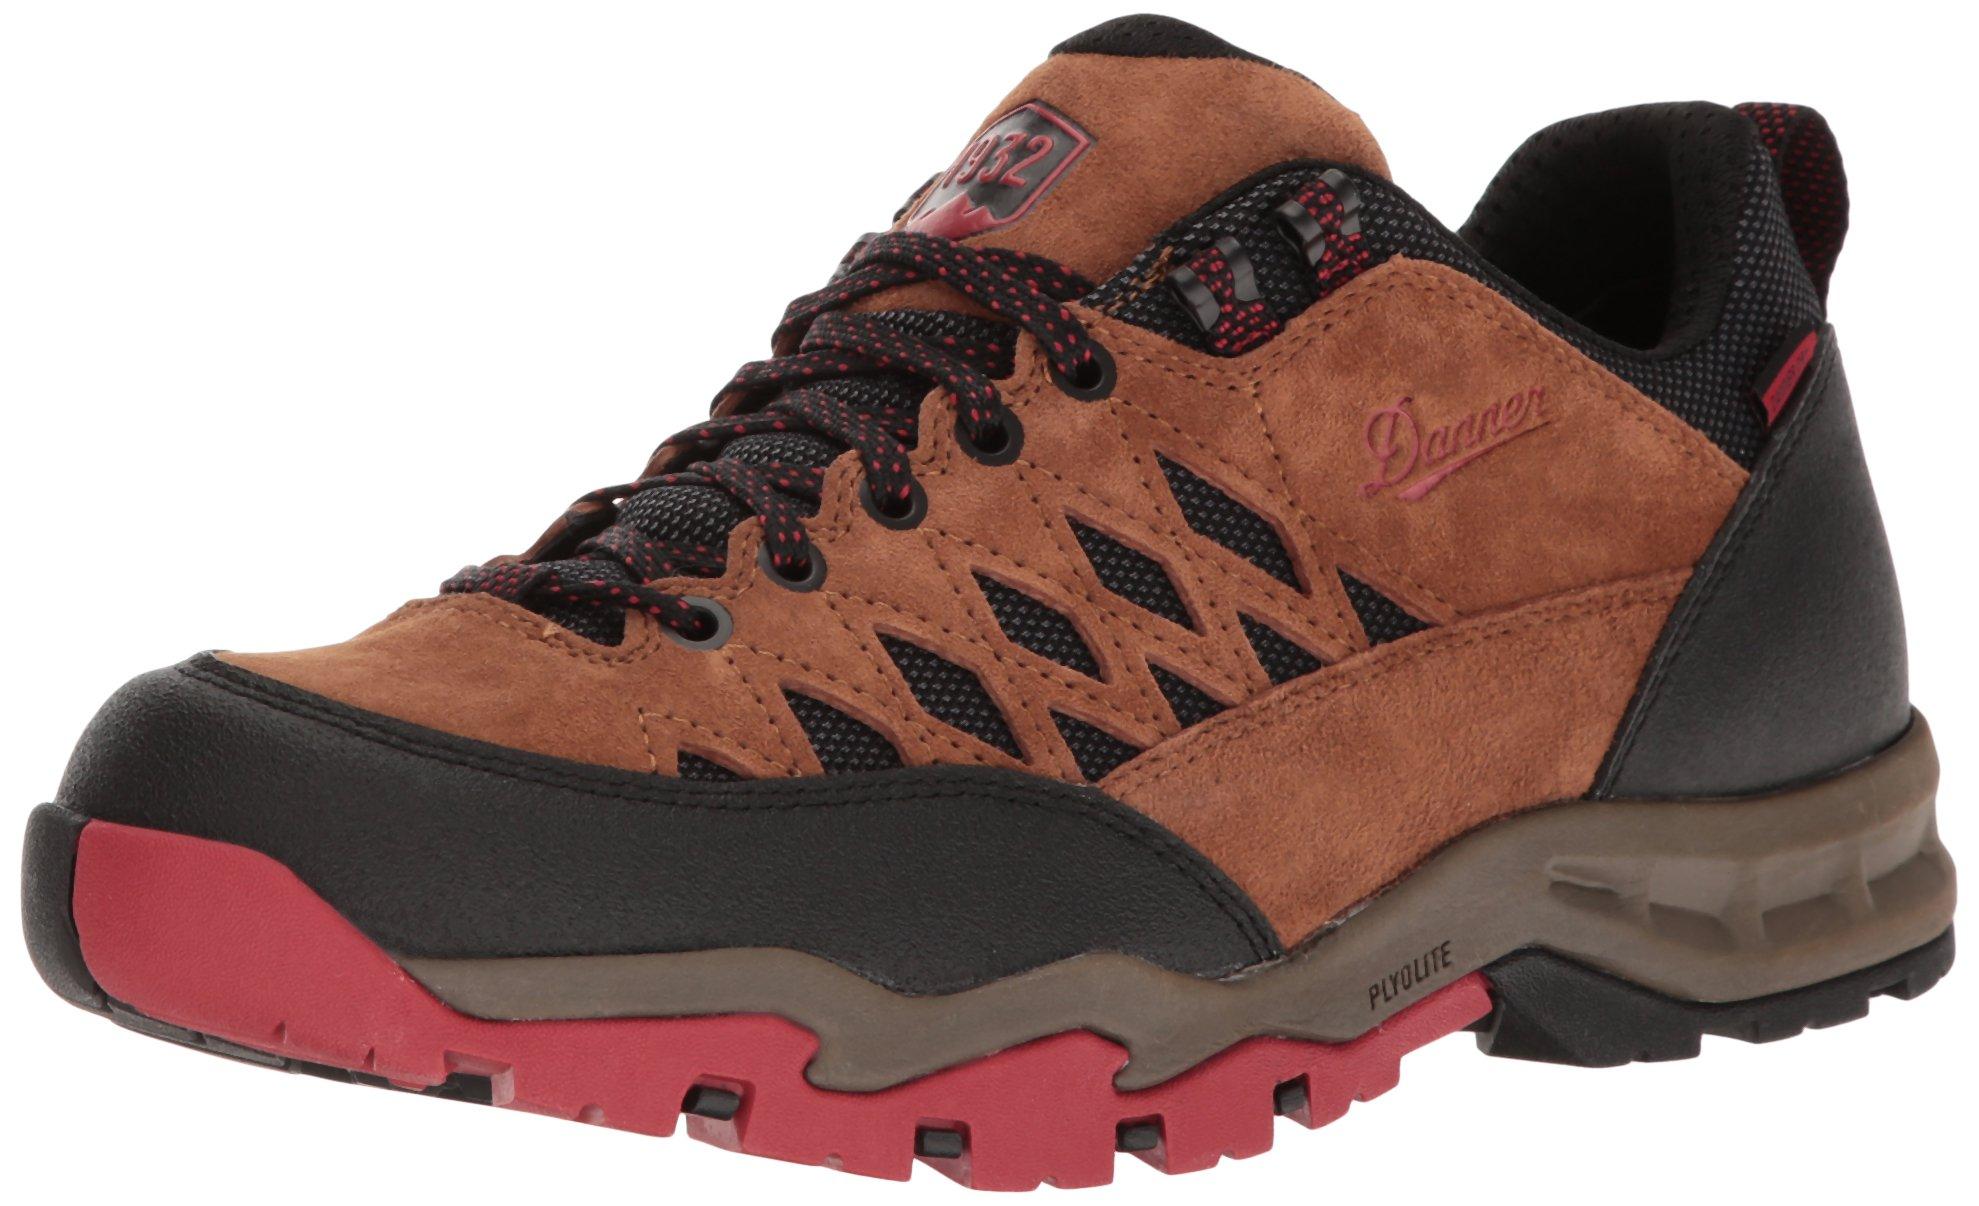 "Danner Men/'s 61380 Outdoor TrailTrek Light Brown//Red 3/"" Hiking Hiker Shoes Boots"